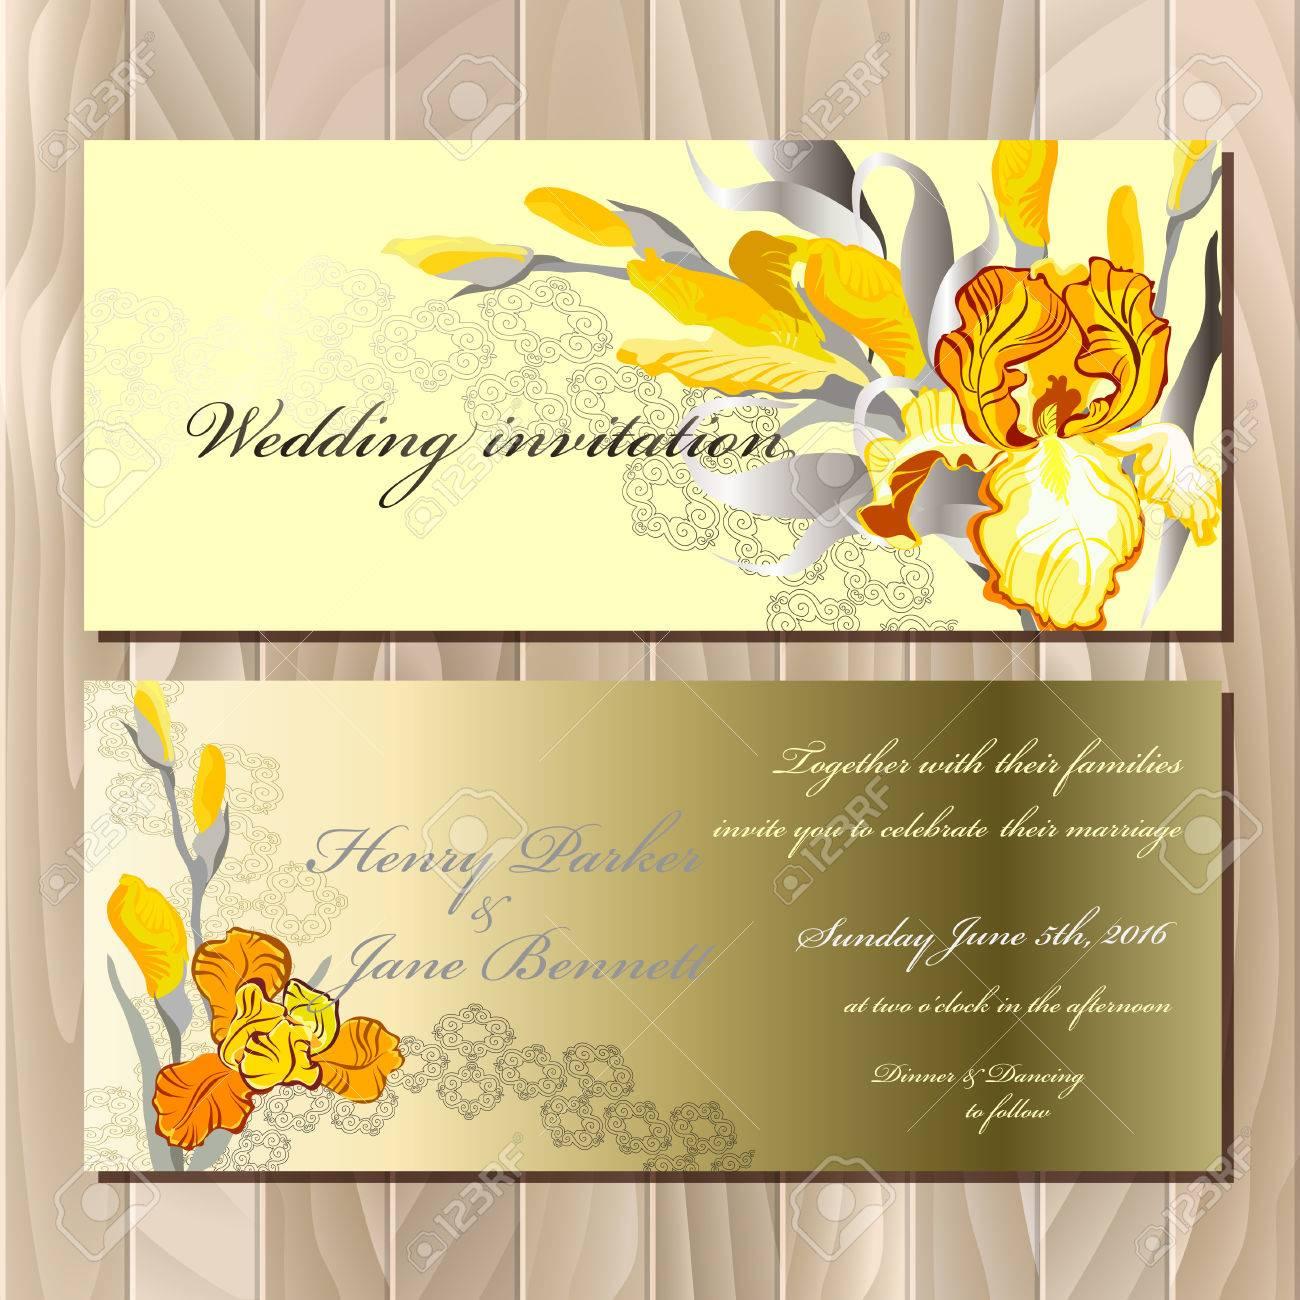 Wedding card with yellow orange golden iris flower bouquet banco de imagens wedding card with yellow orange golden iris flower bouquet background golden yellow iris hand drawn vector illustration izmirmasajfo